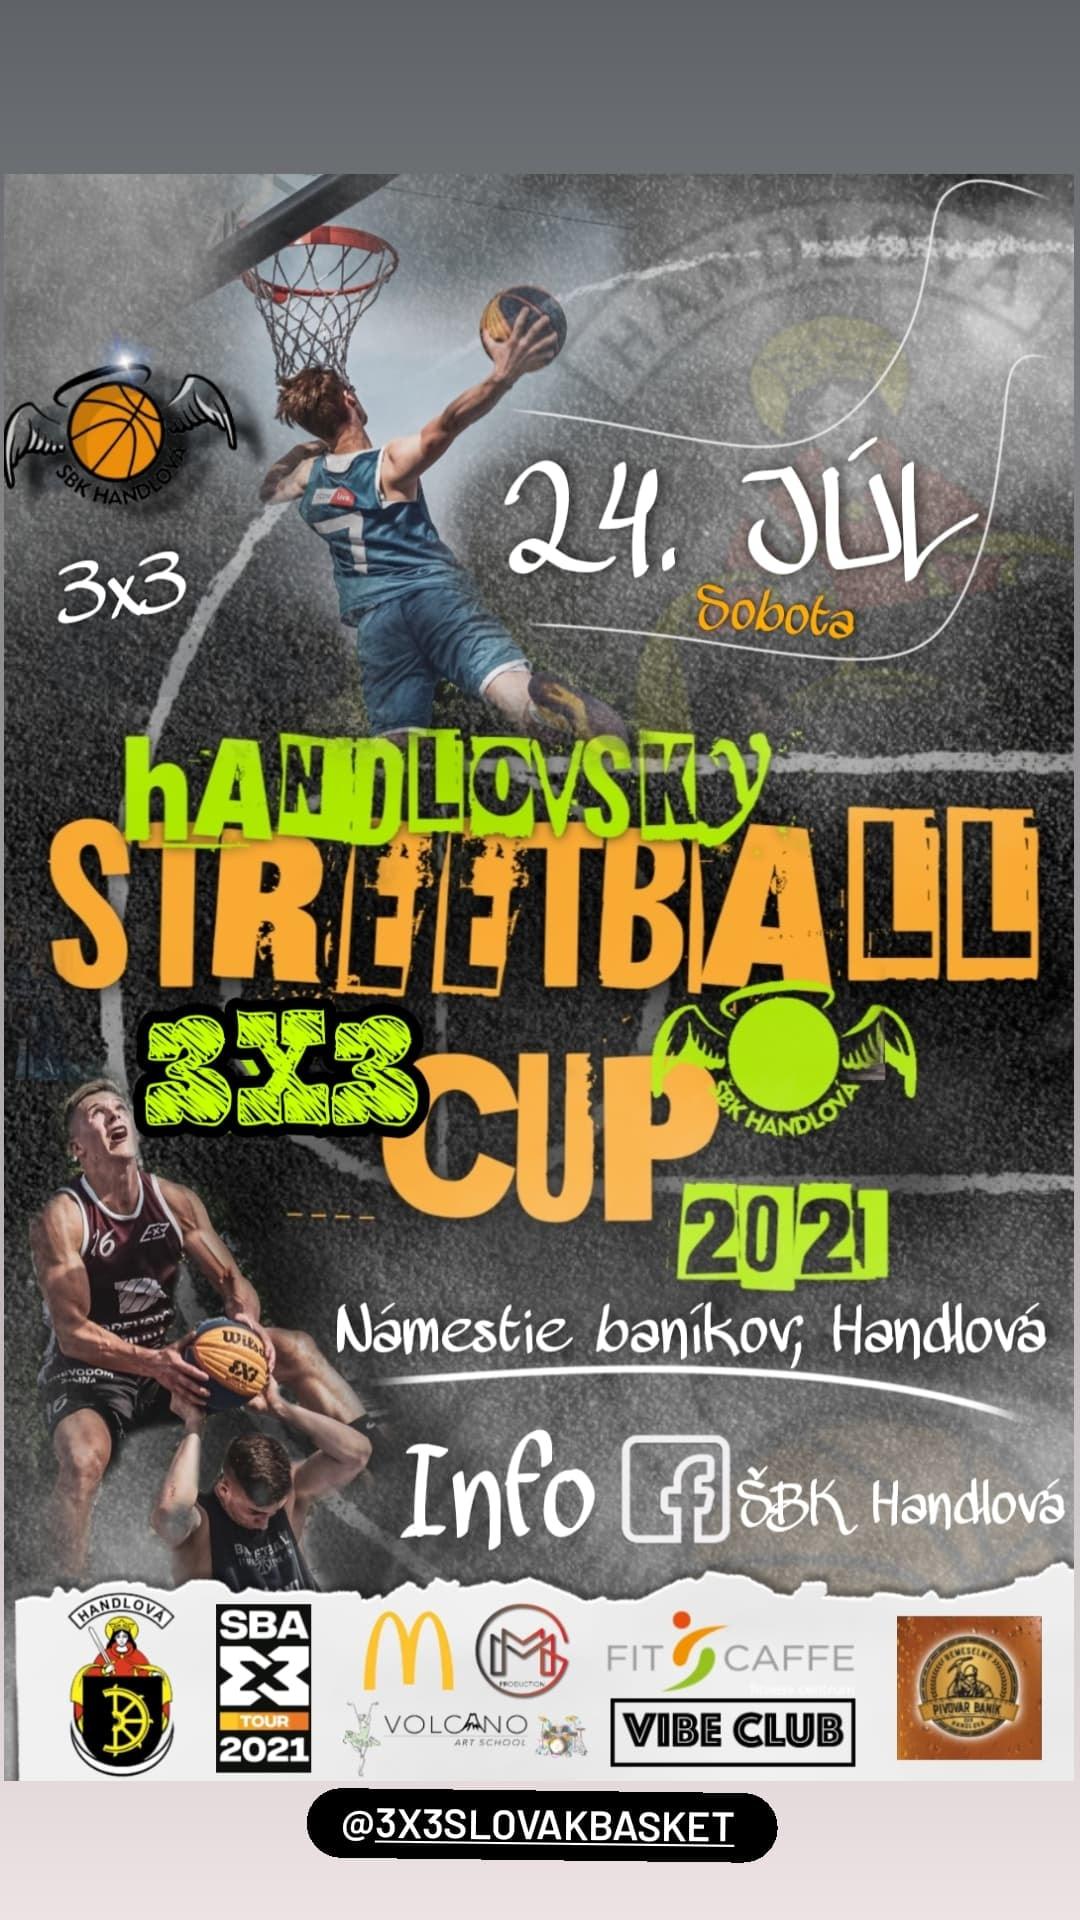 streetball_3x3_2